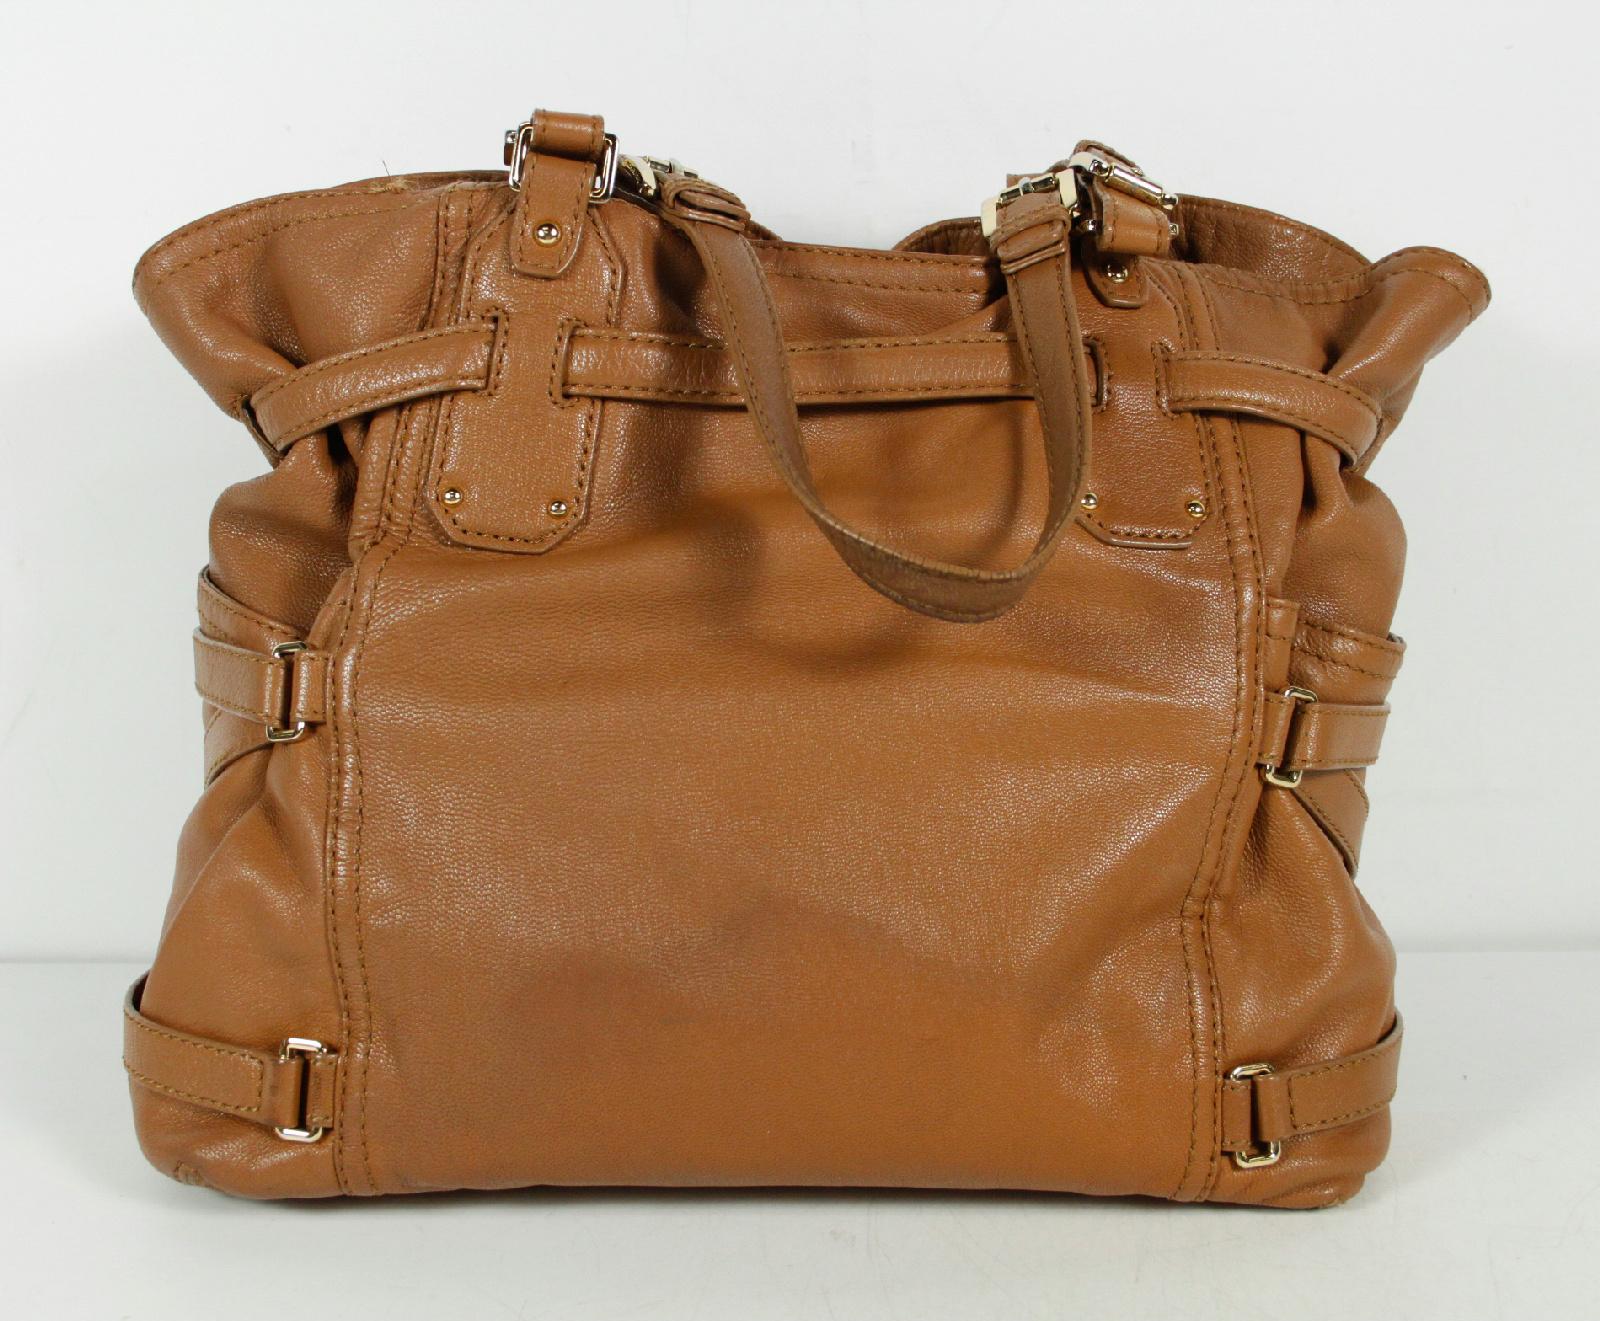 Michael Kors Brown Leather Gold Tone Hardware Buckle Drawstring Satchel Bag Ebay